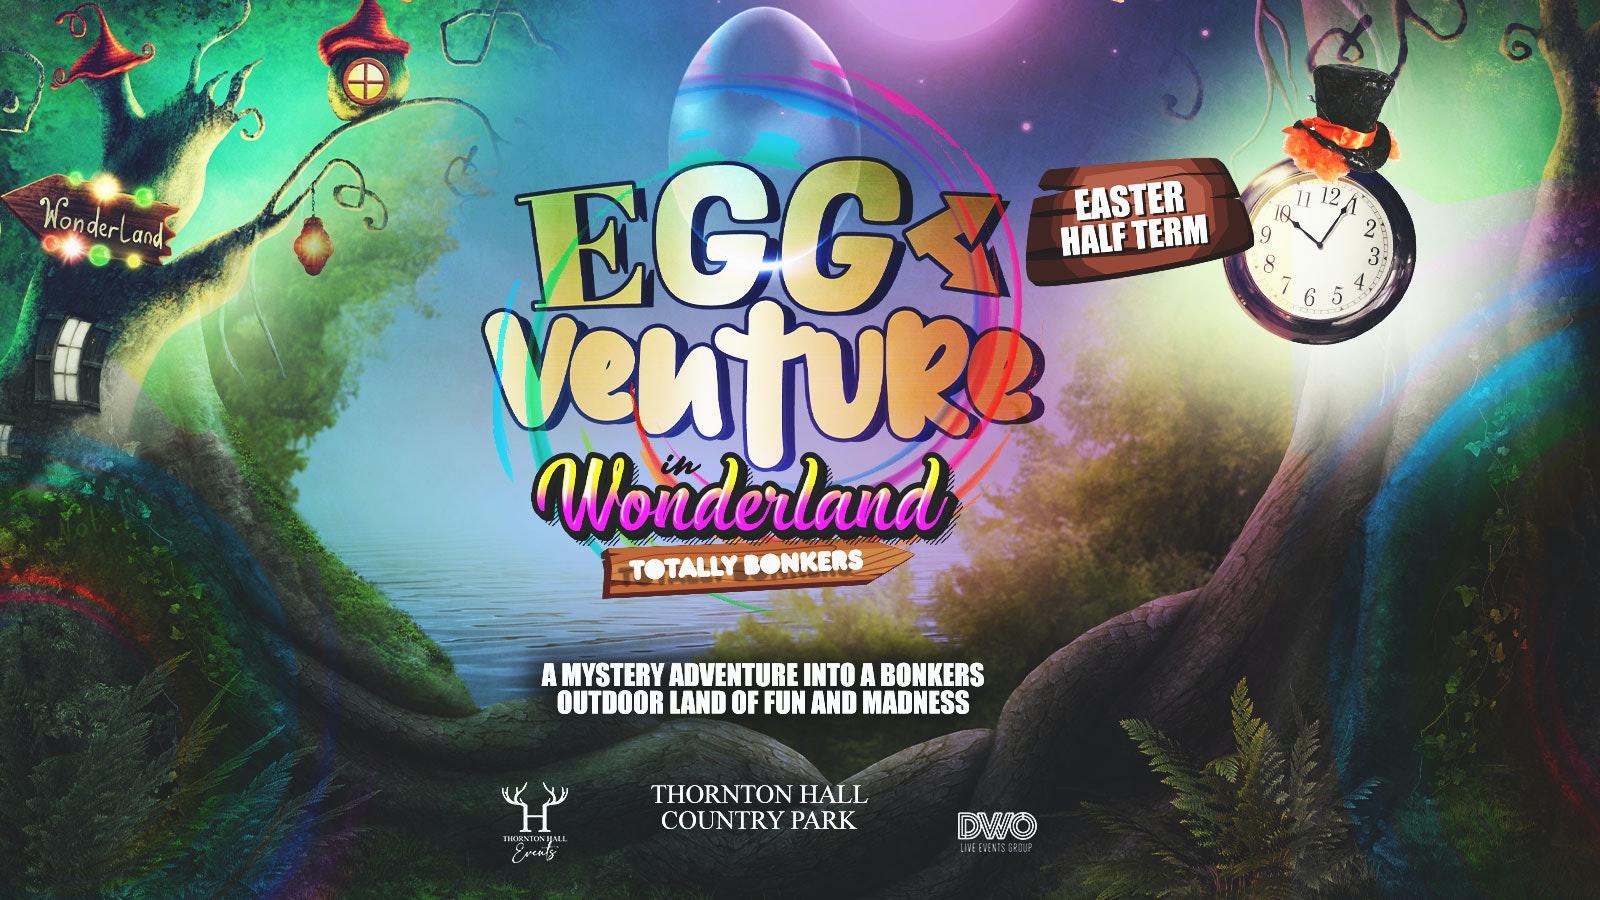 EggVenture in Wonderland -Sunday 11th April – 11am